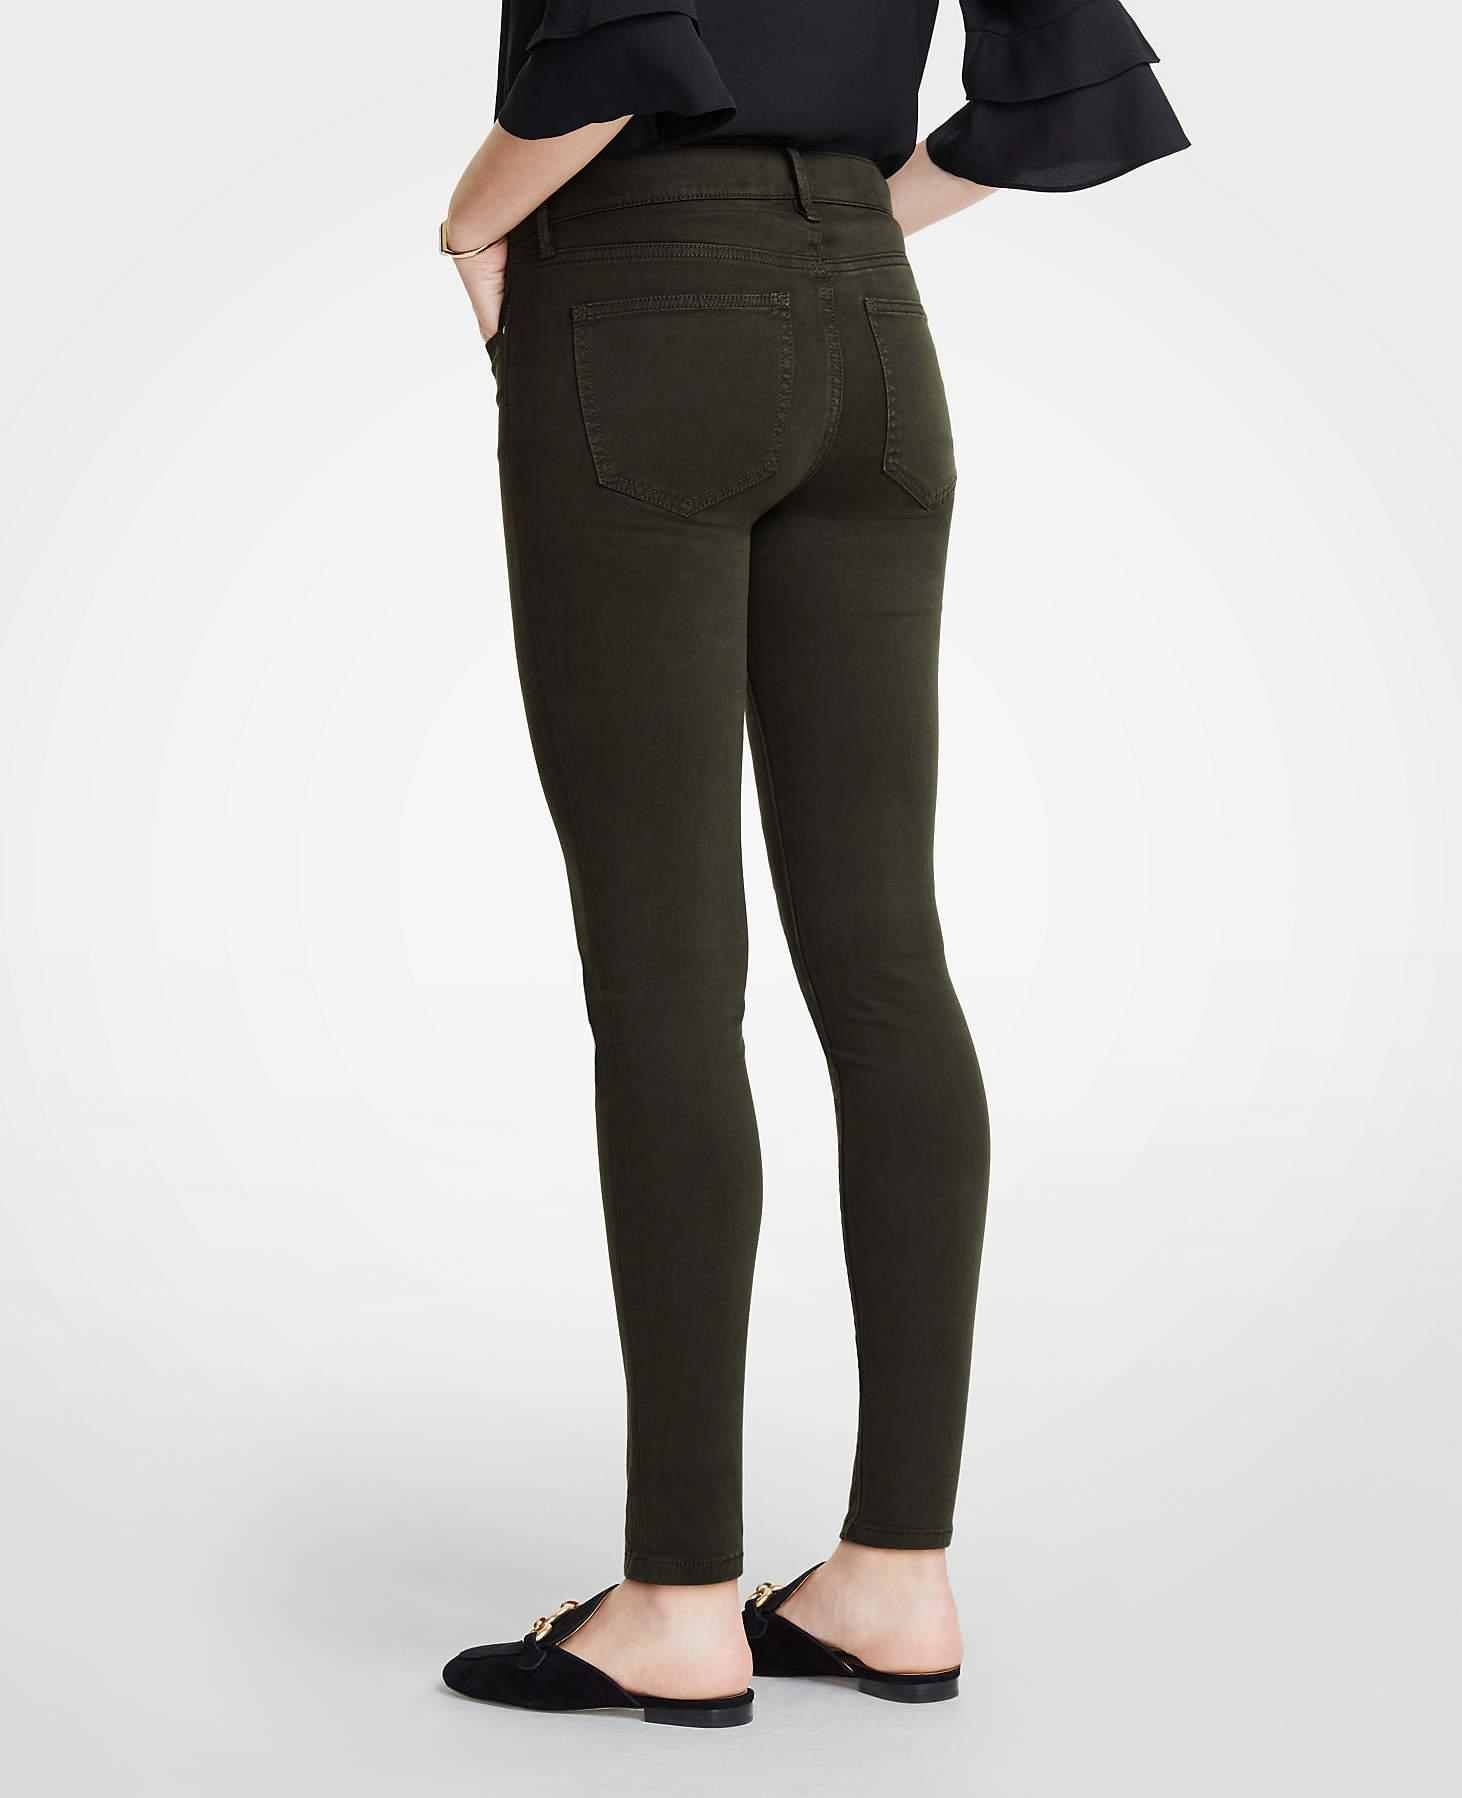 0d9362fd1385 Ann Taylor Curvy Performance Stretch Skinny Jeans In Sateen - Lyst